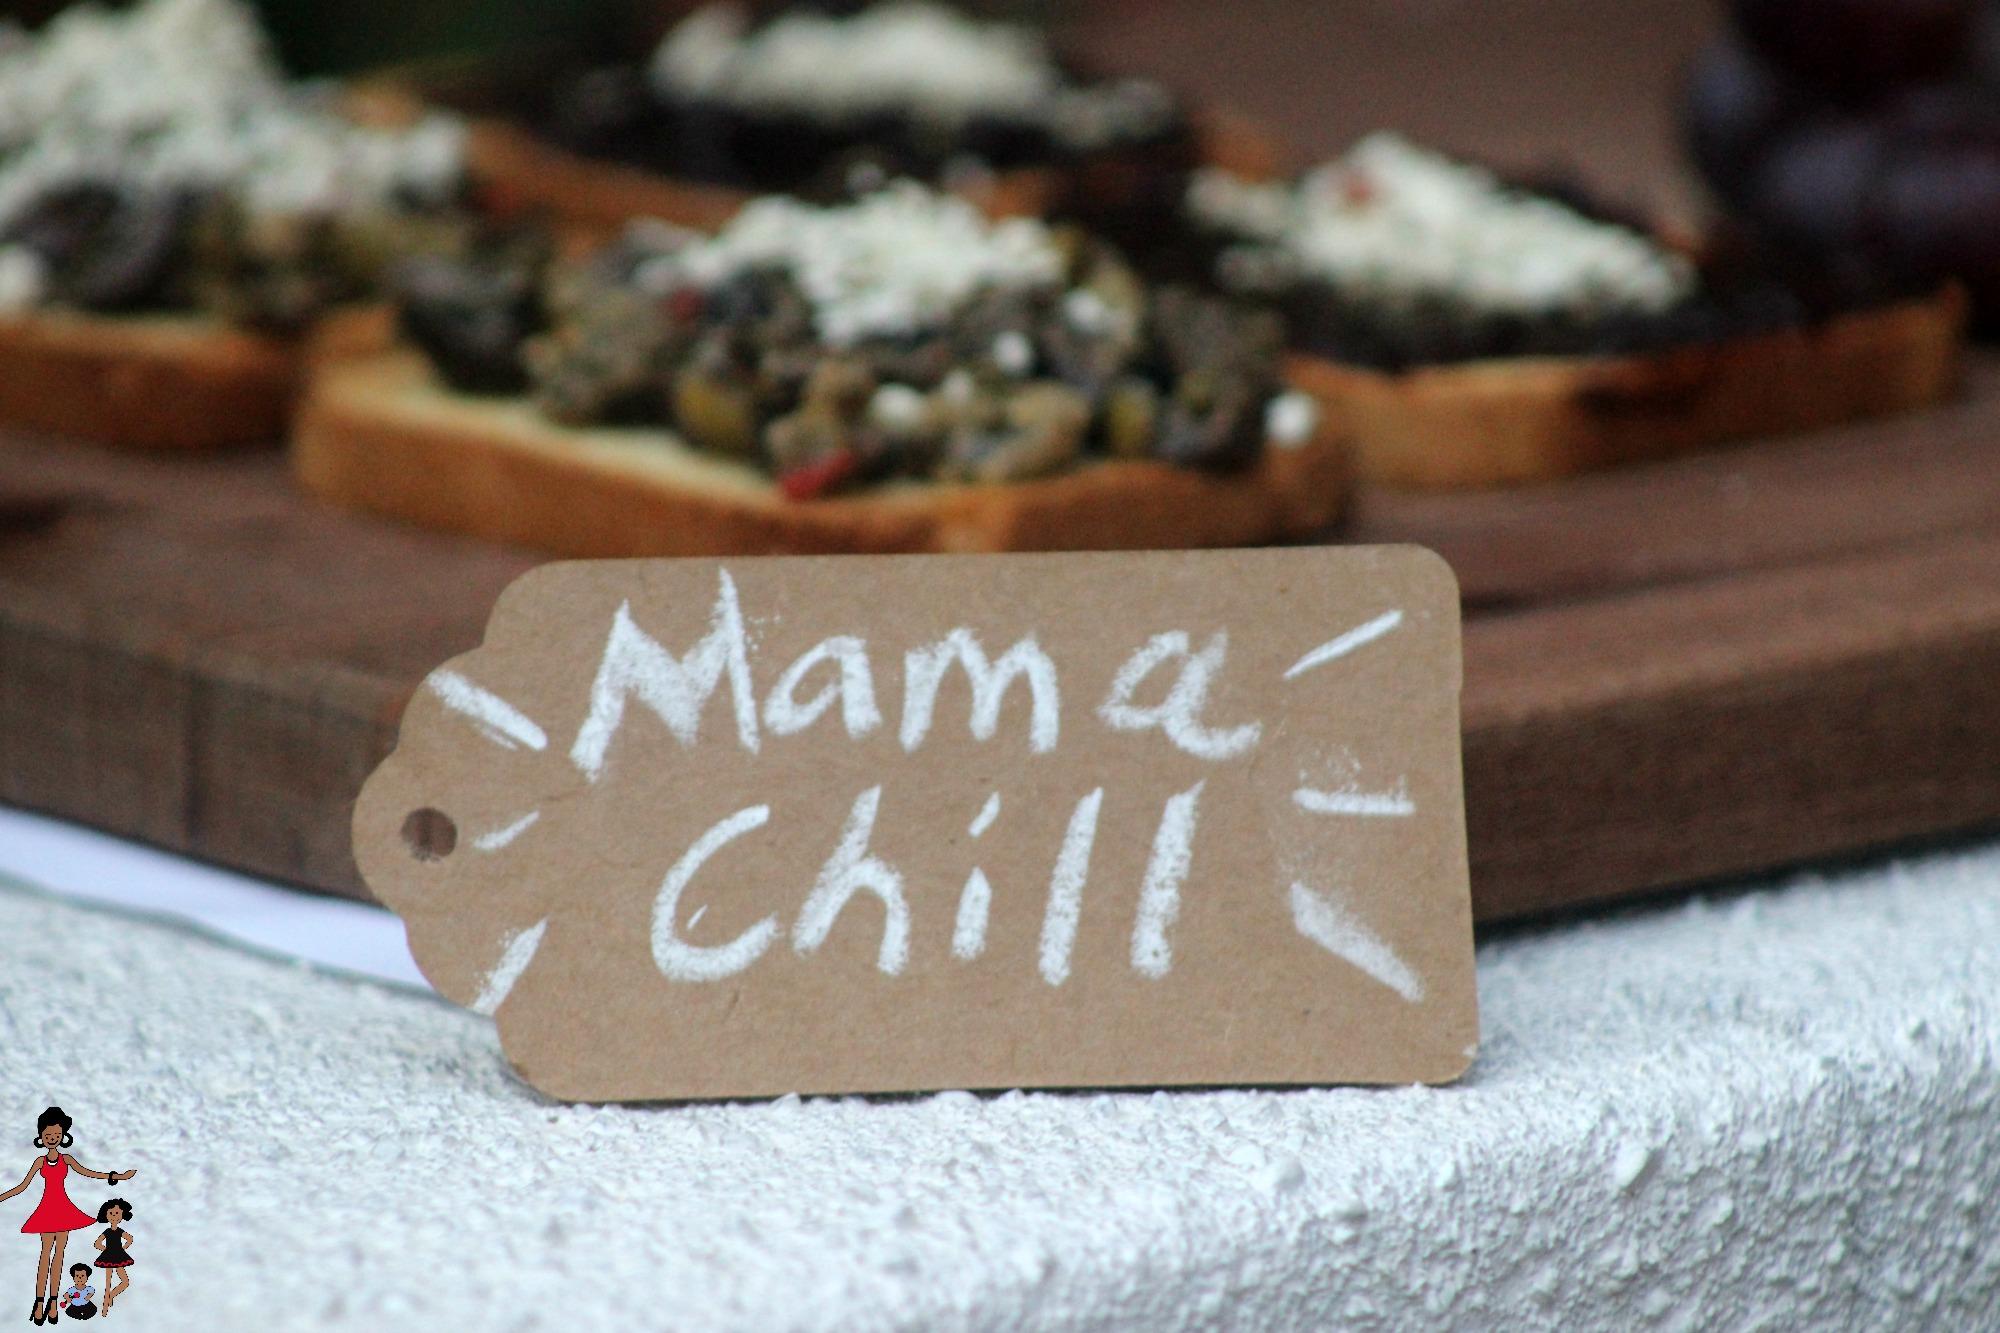 Mama-chill-jam-cellars